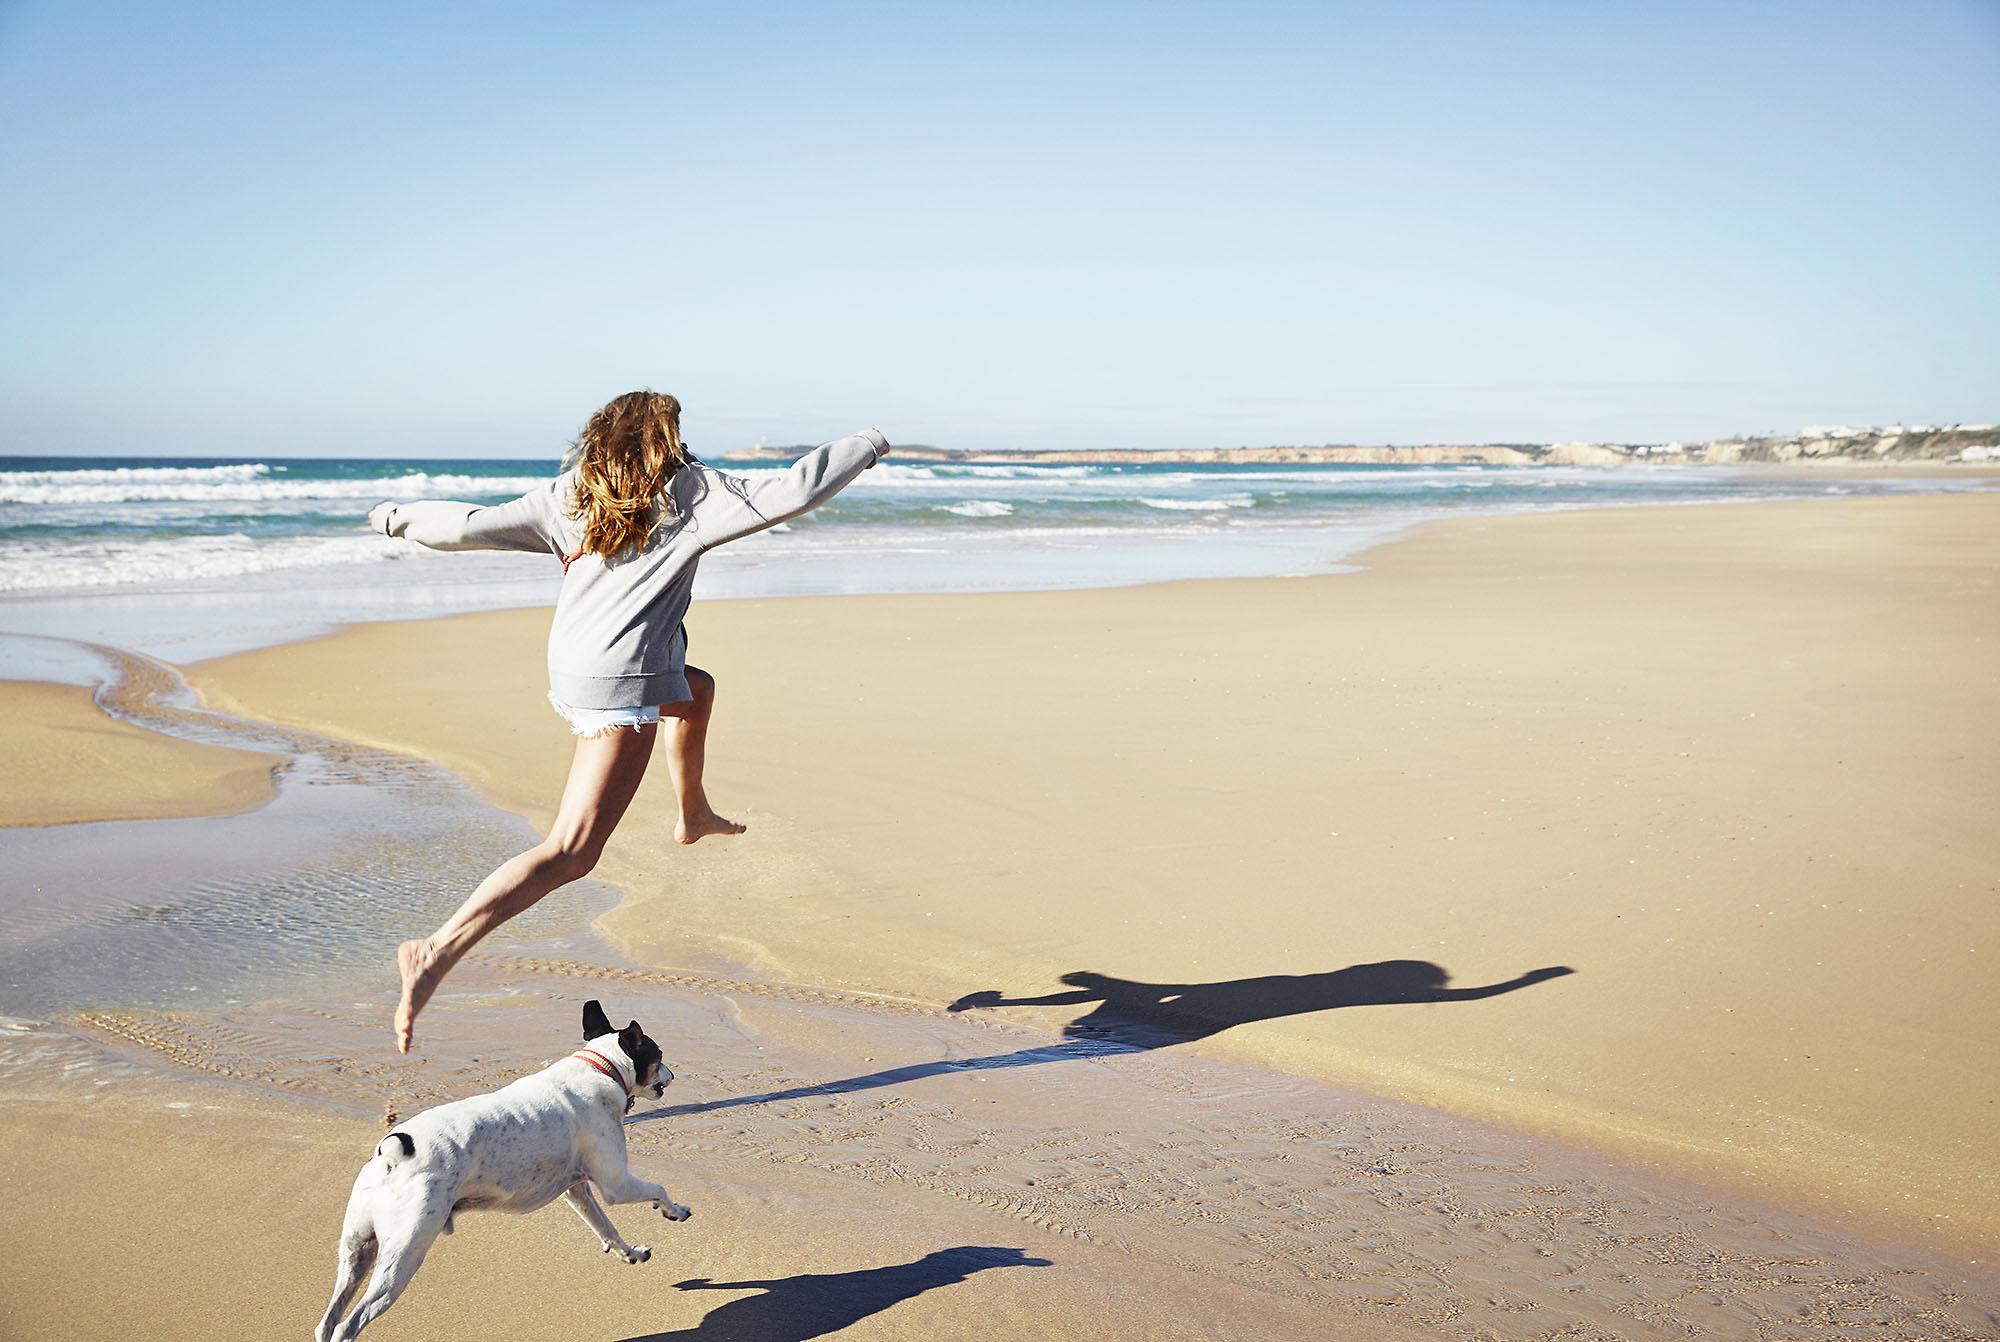 Karan Kapoor girl and dog running on beach